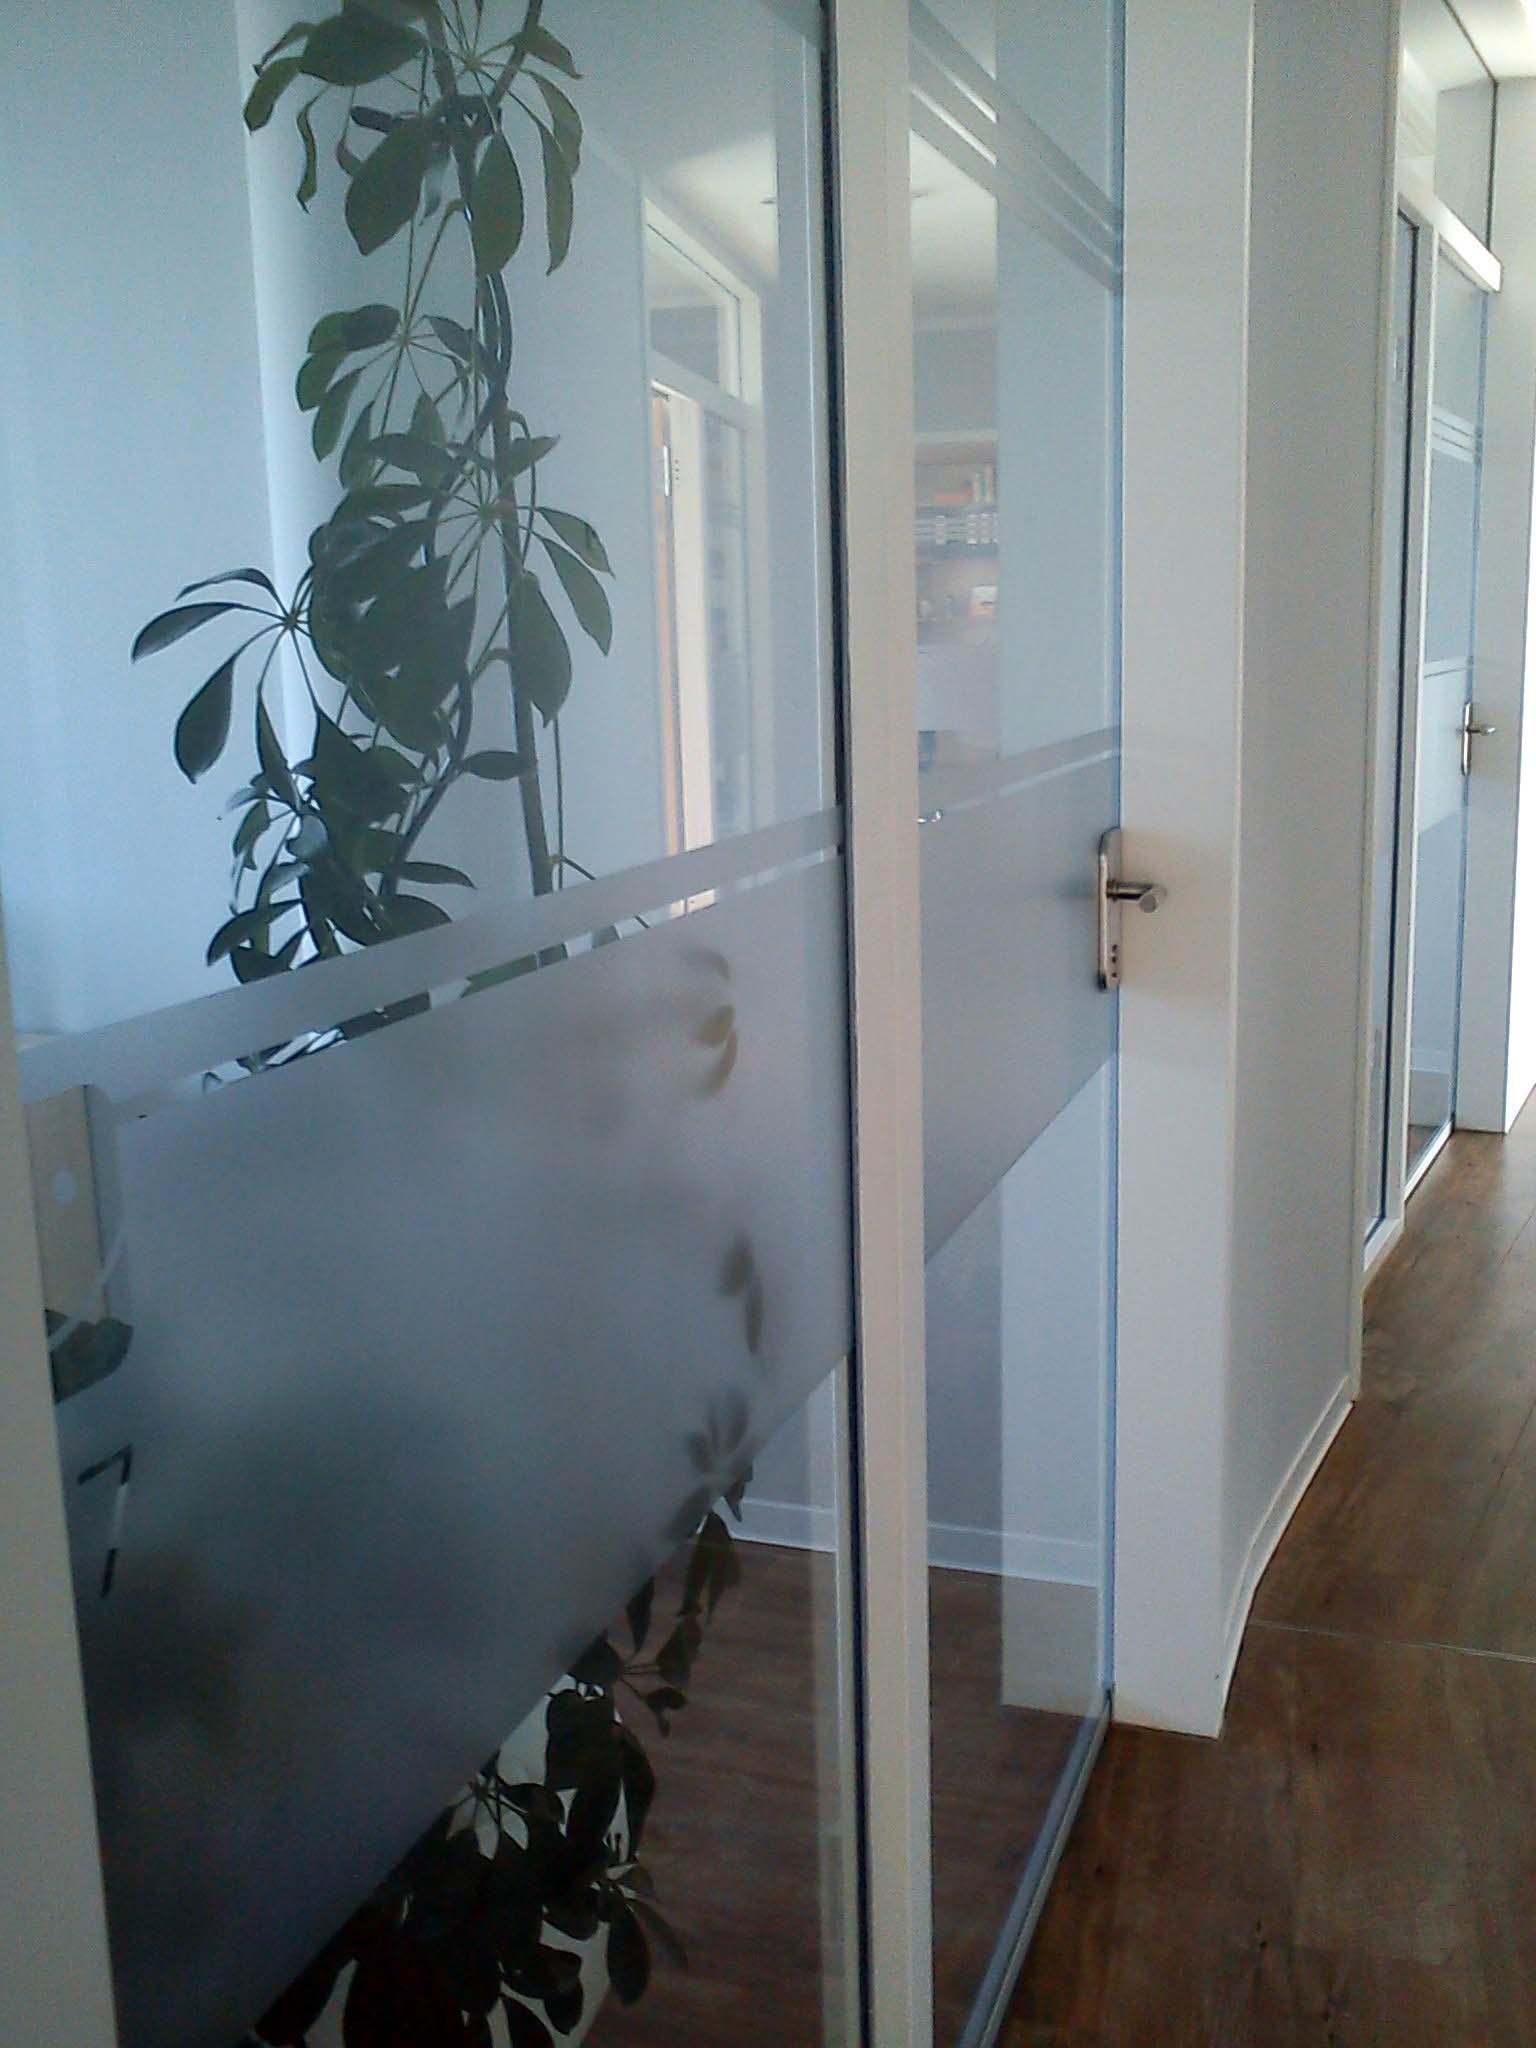 Limpieza de cristales en zaragoza cangurin for Oficina de extranjeria zaragoza